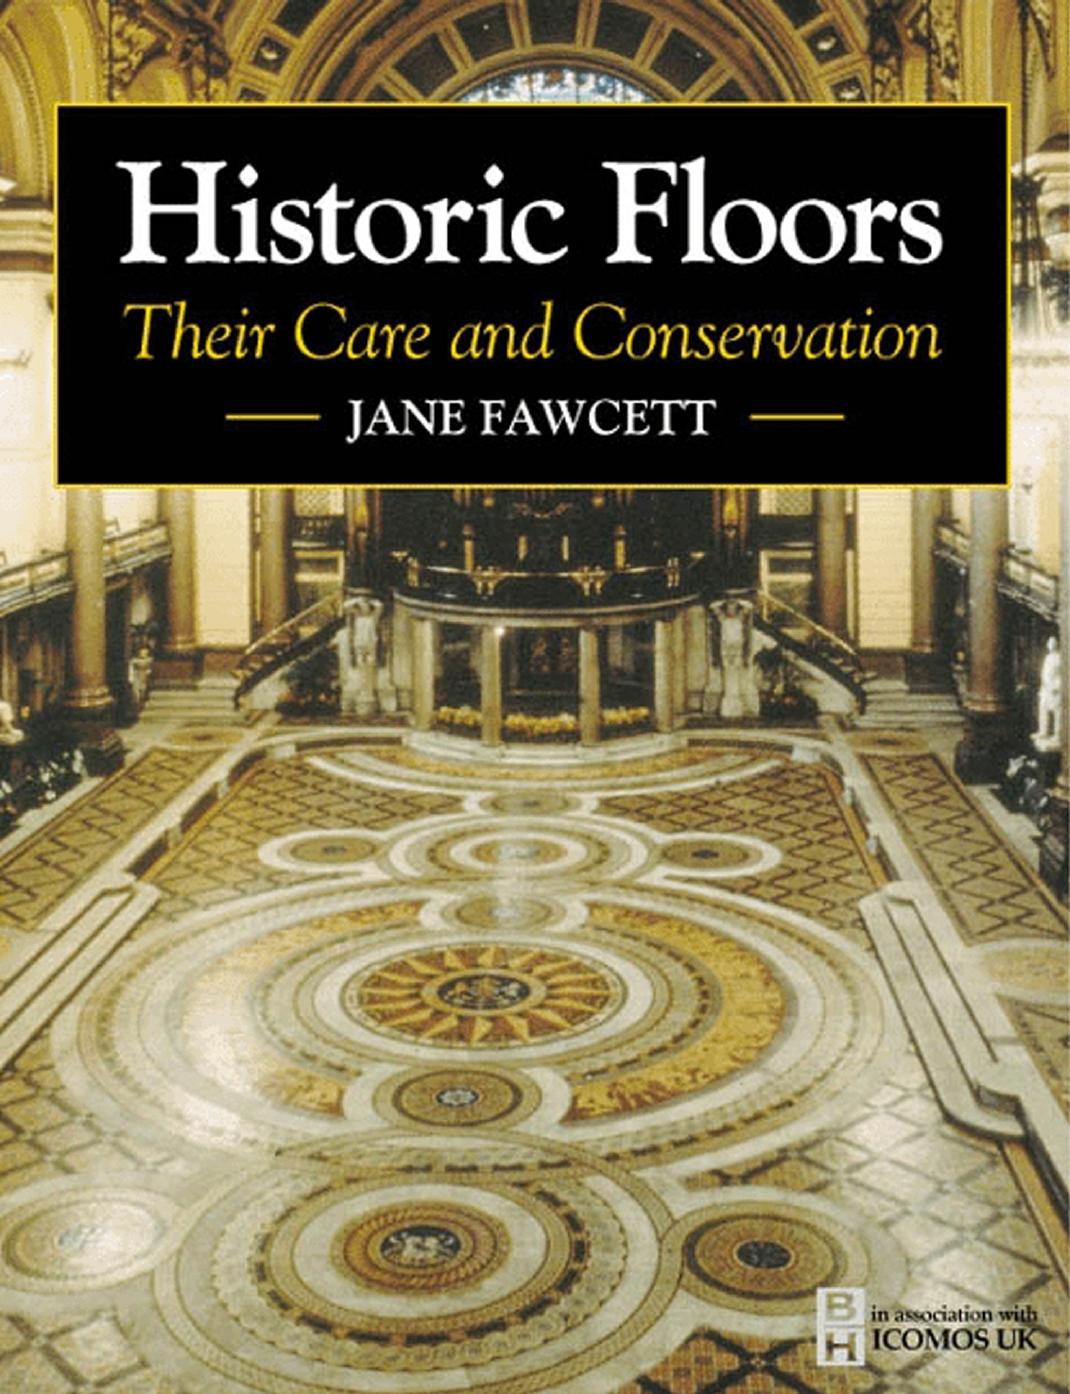 Garten Versailles Elegant Historic Floors Care and Conservation